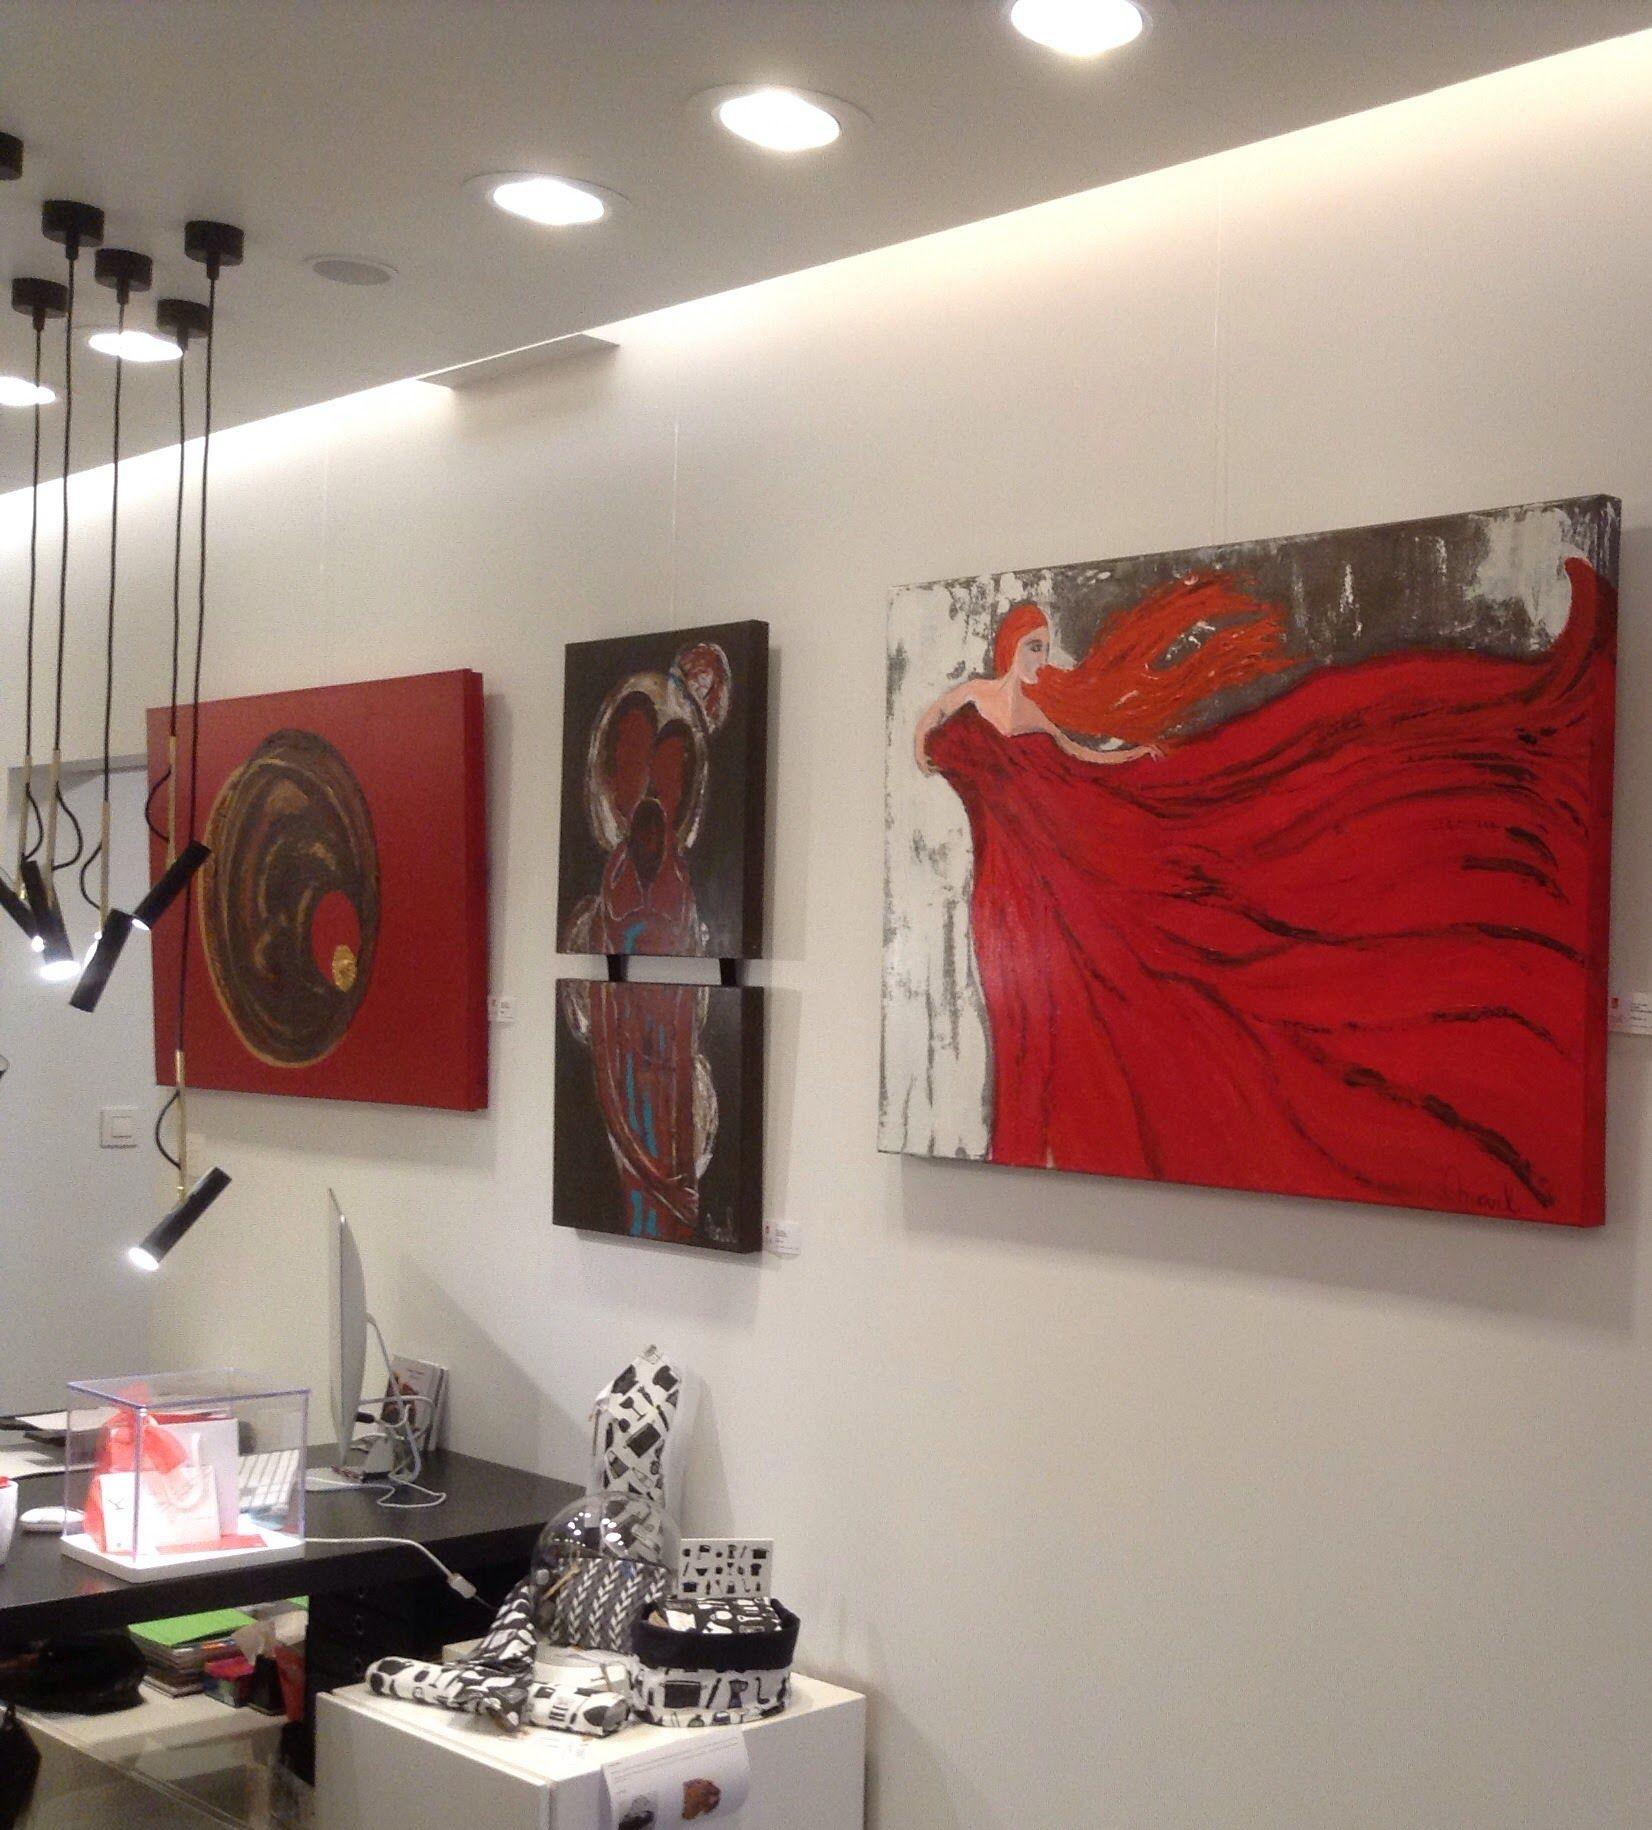 Painting's of Marl www.marlartpainting.blogspot.be